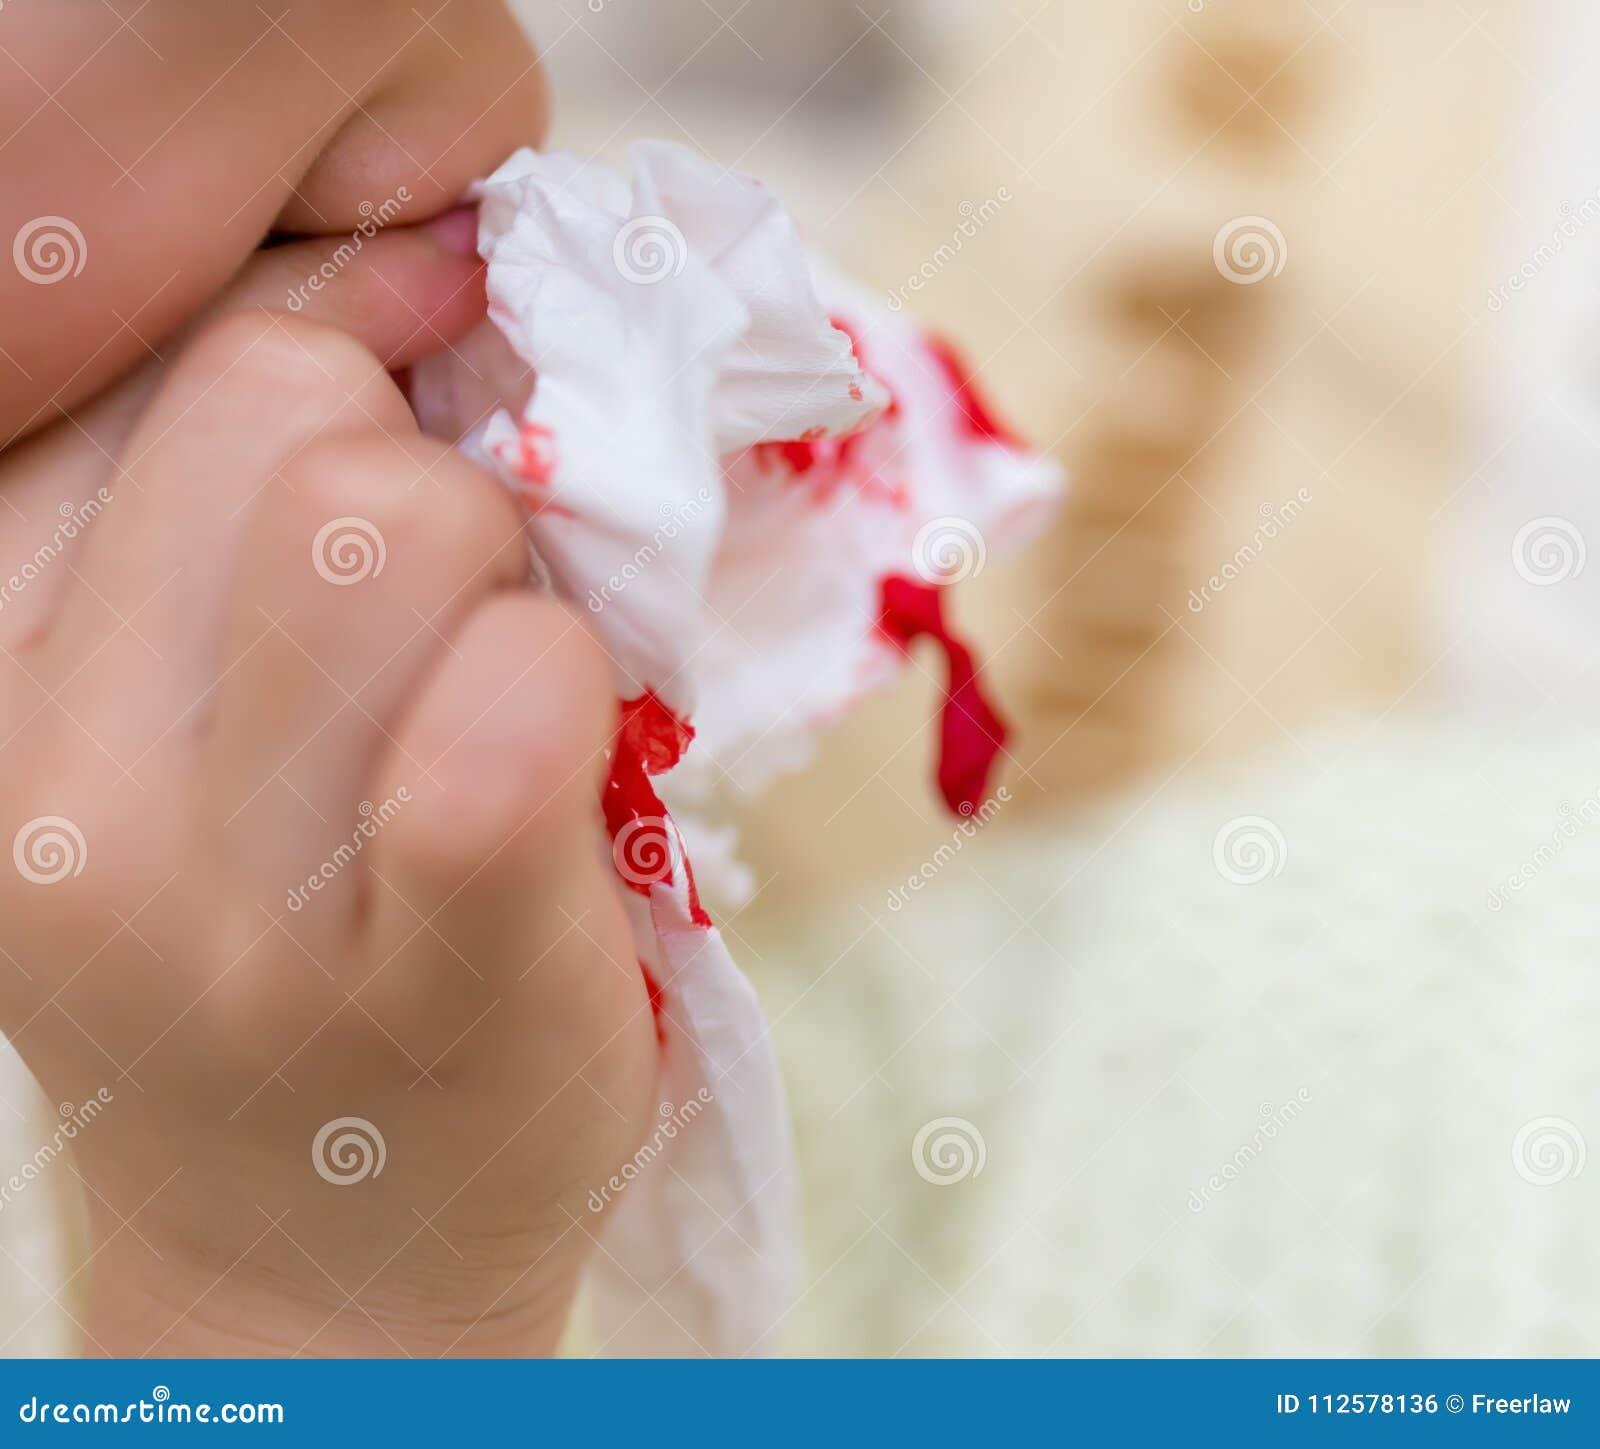 Kid Using Tissue To Stop Nose Bleeding Stock Photo - Image ...